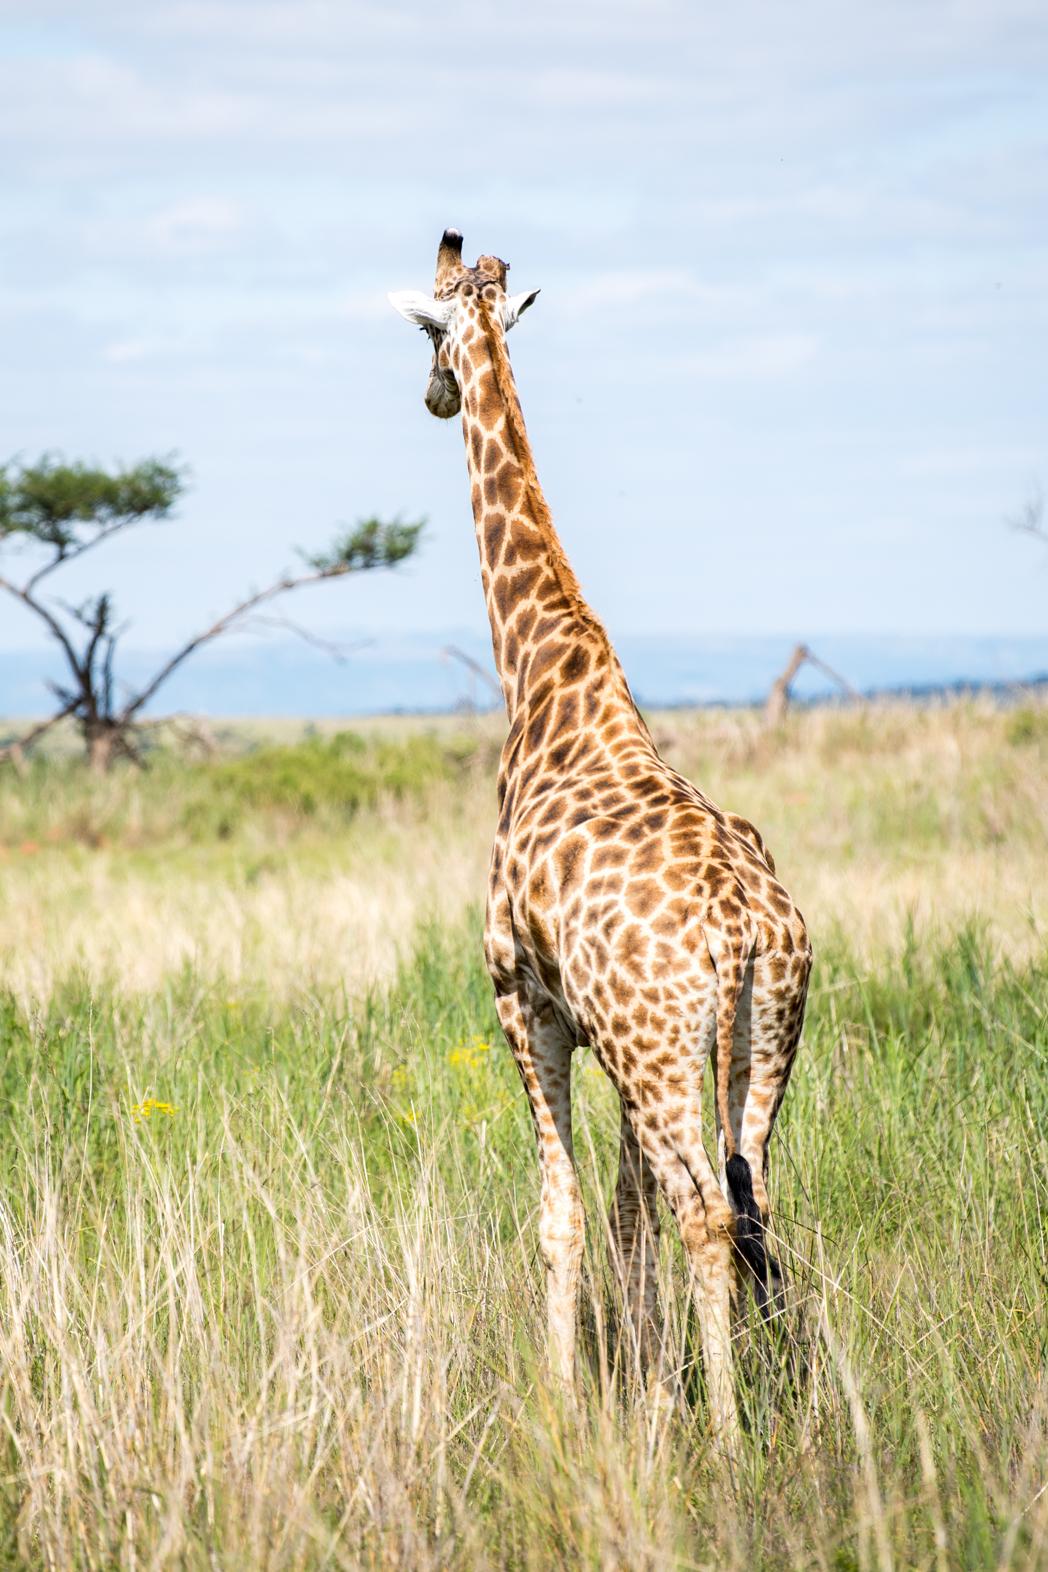 Stacie Flinner x Rovos Rail Durban Safari Nambiti-1